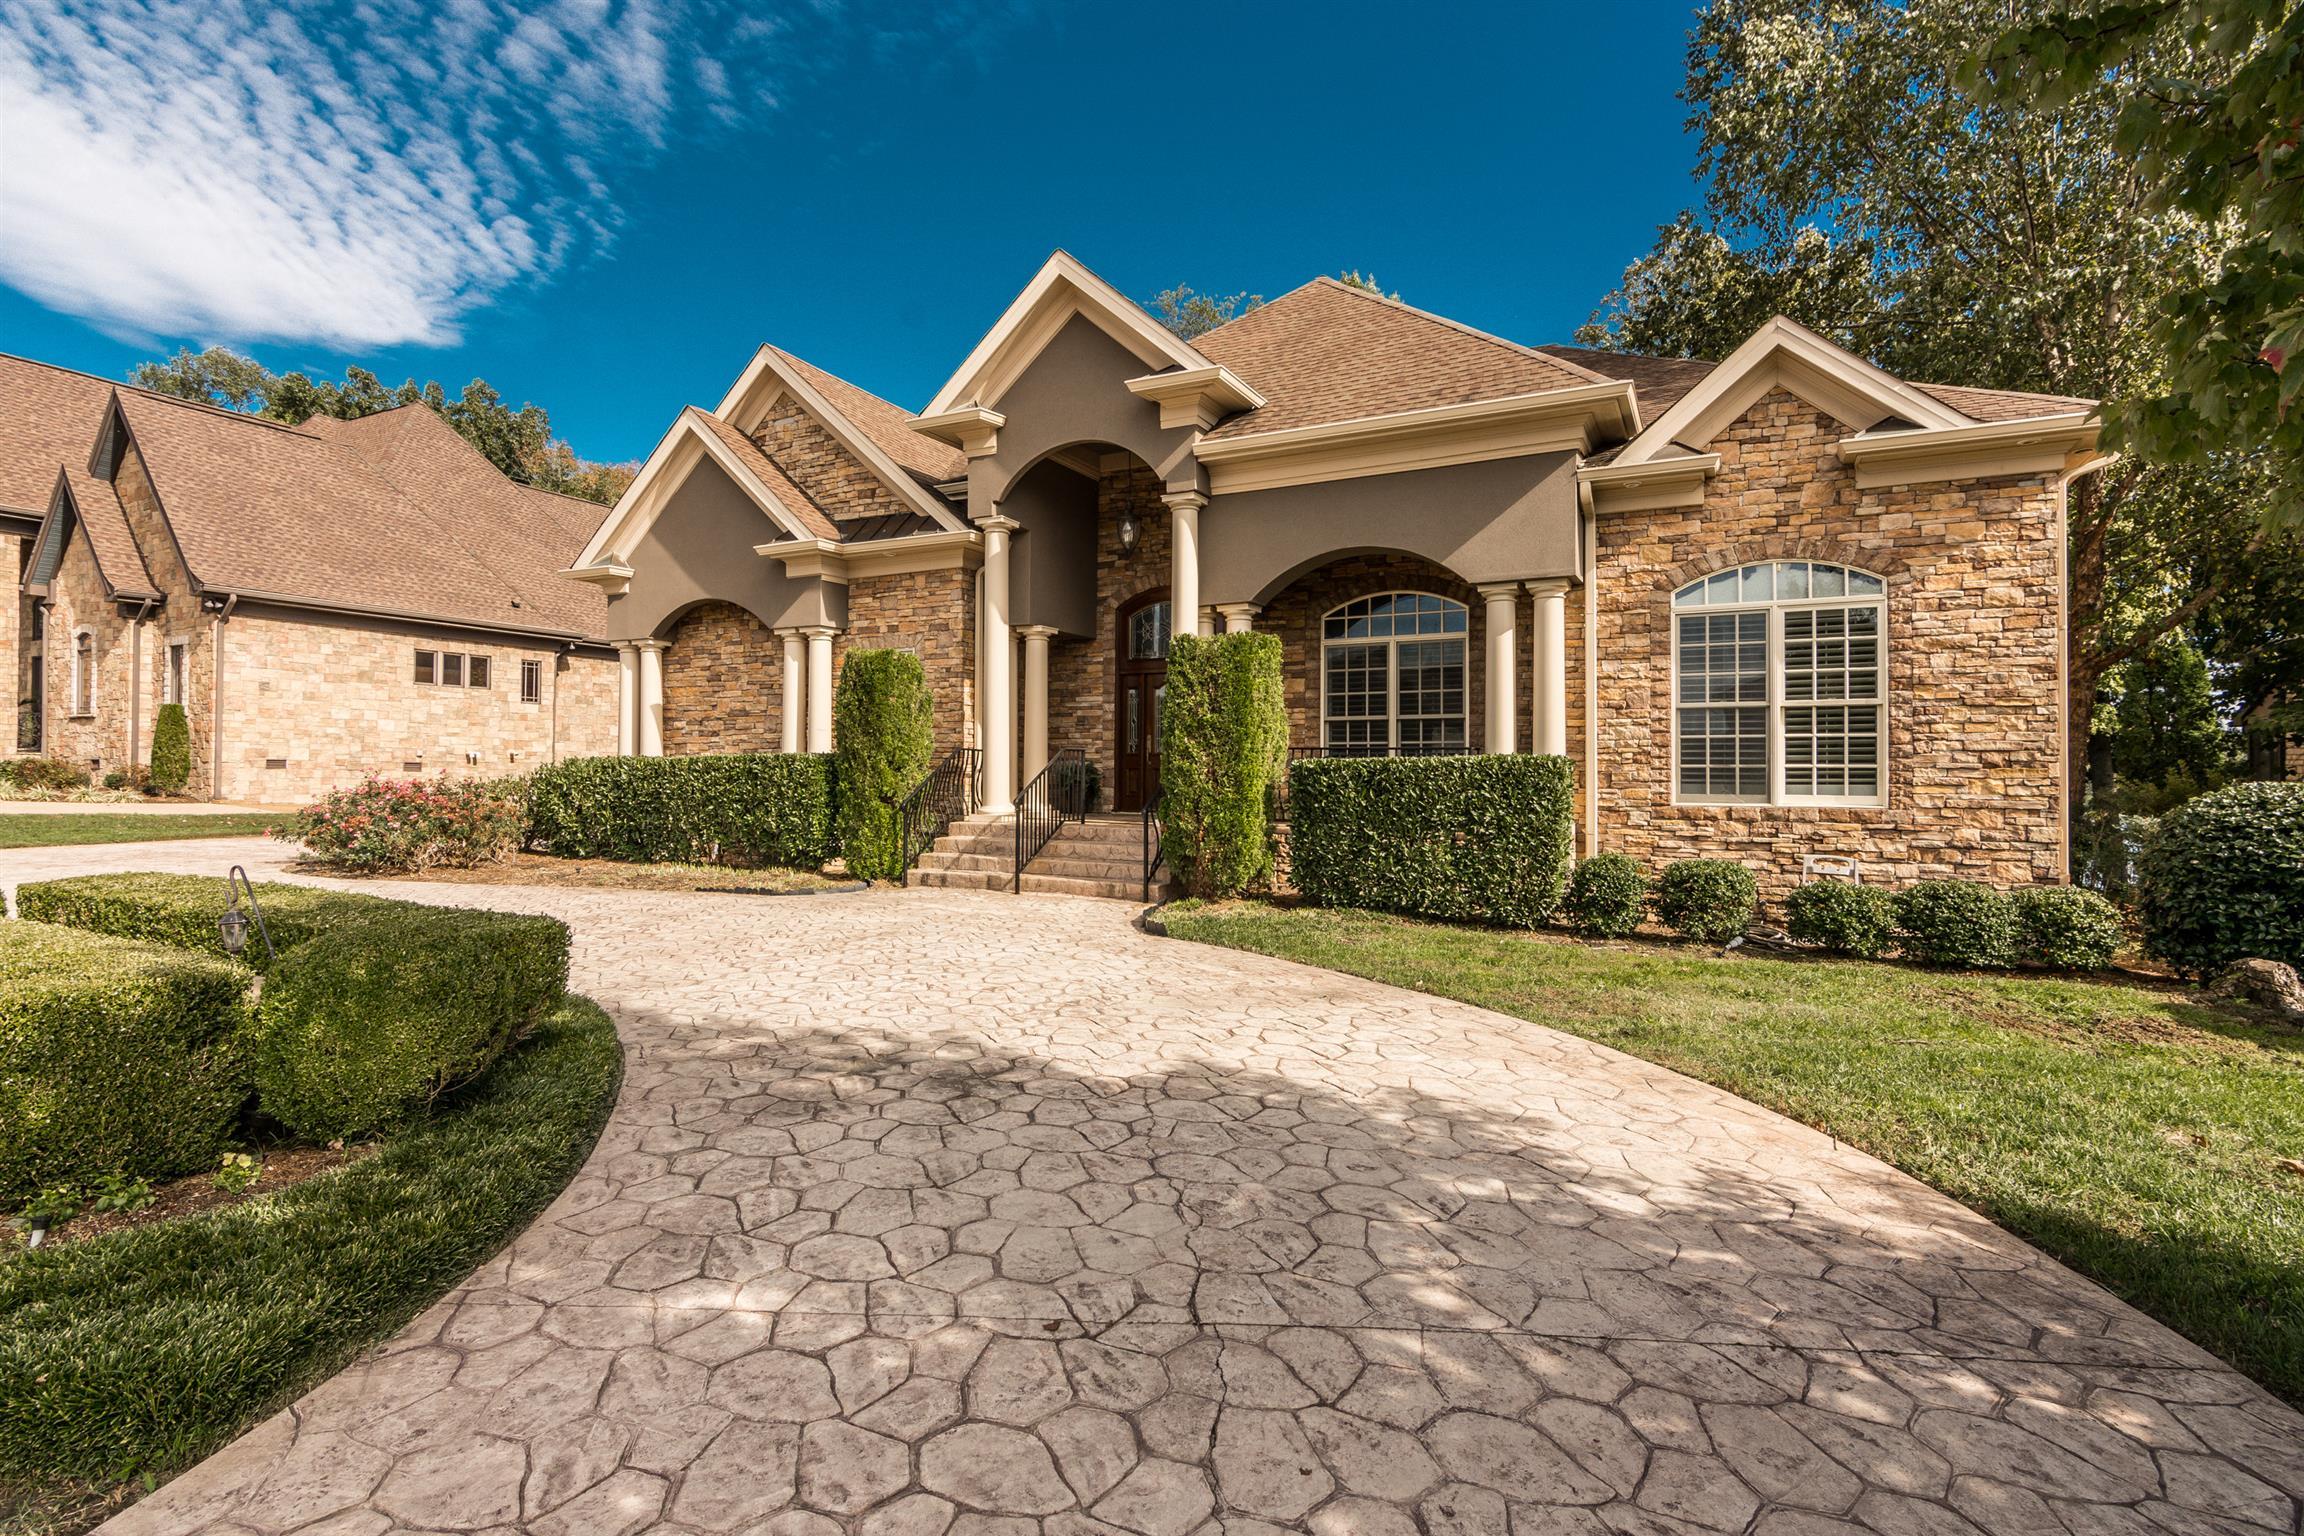 768 Plantation Way, Gallatin, TN 37066 - Gallatin, TN real estate listing